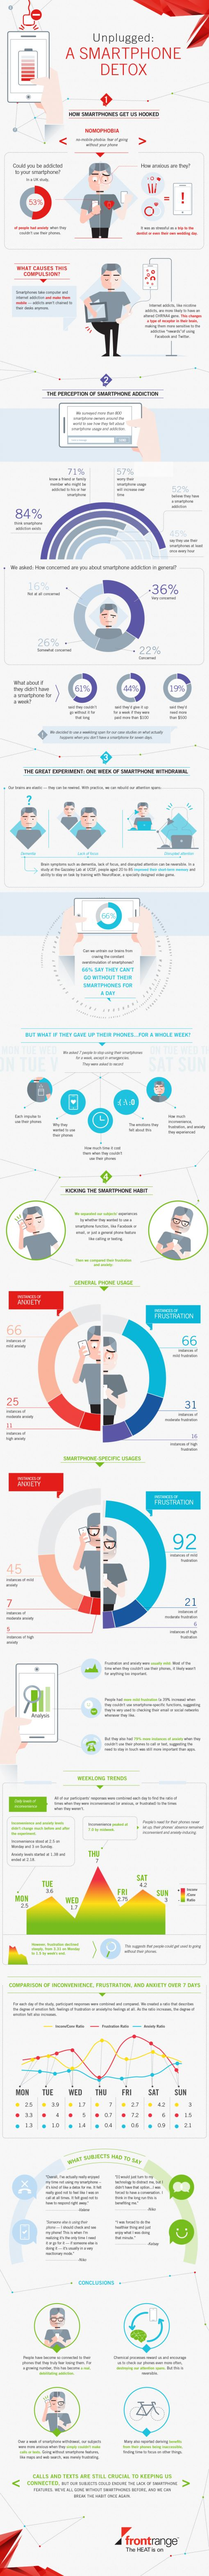 nomophobia-infographic